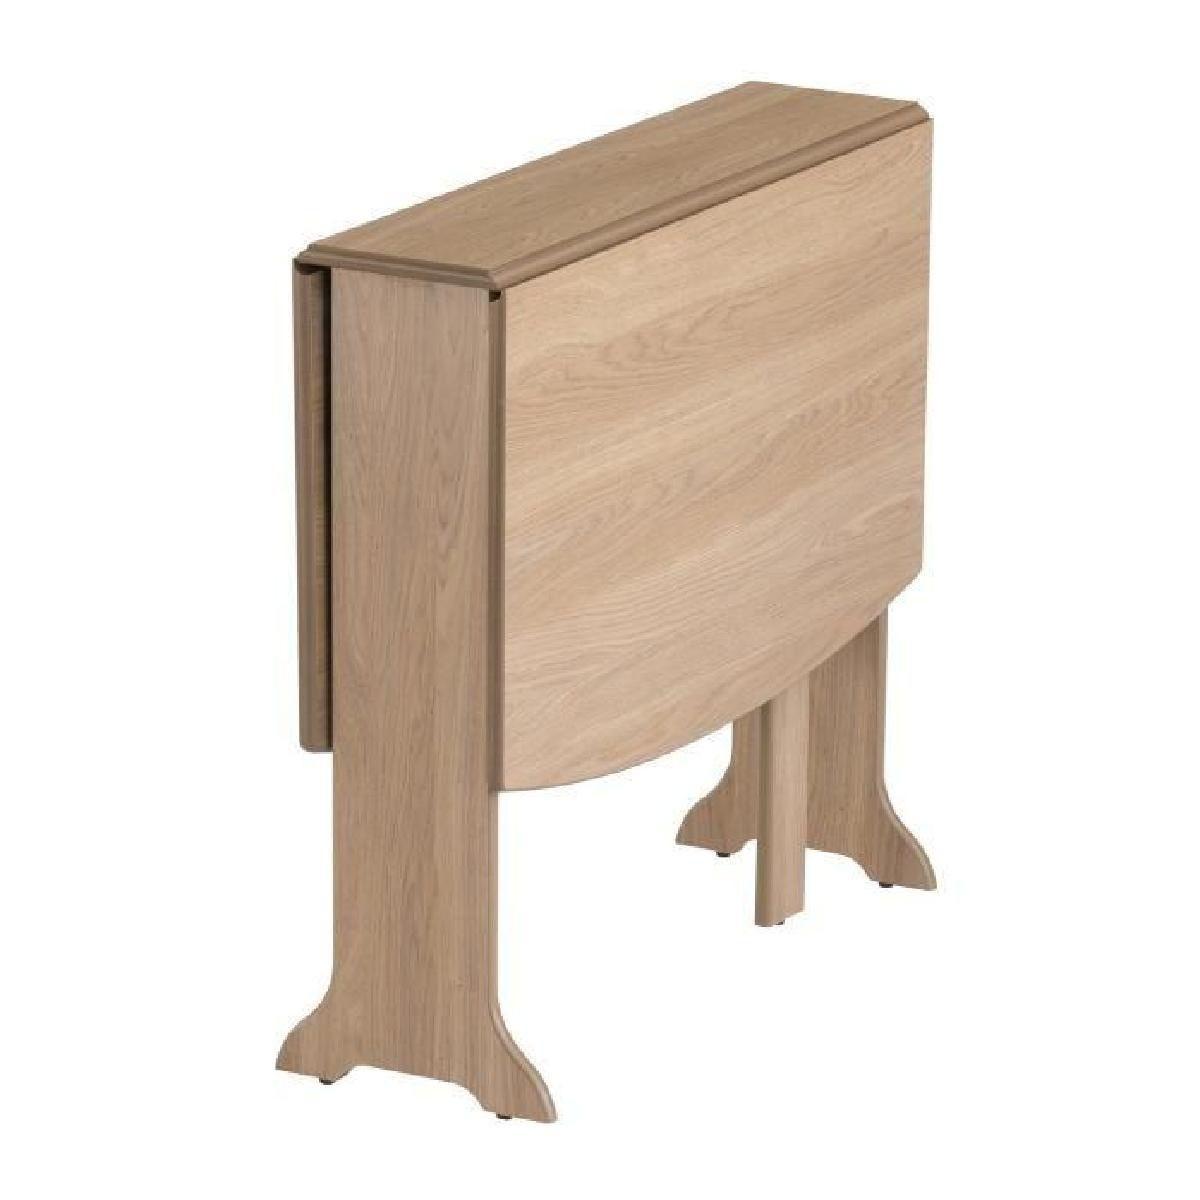 70 Petite Table Pliante Conforama 2020 Petite Table Pliante Table Pliante Table Bois